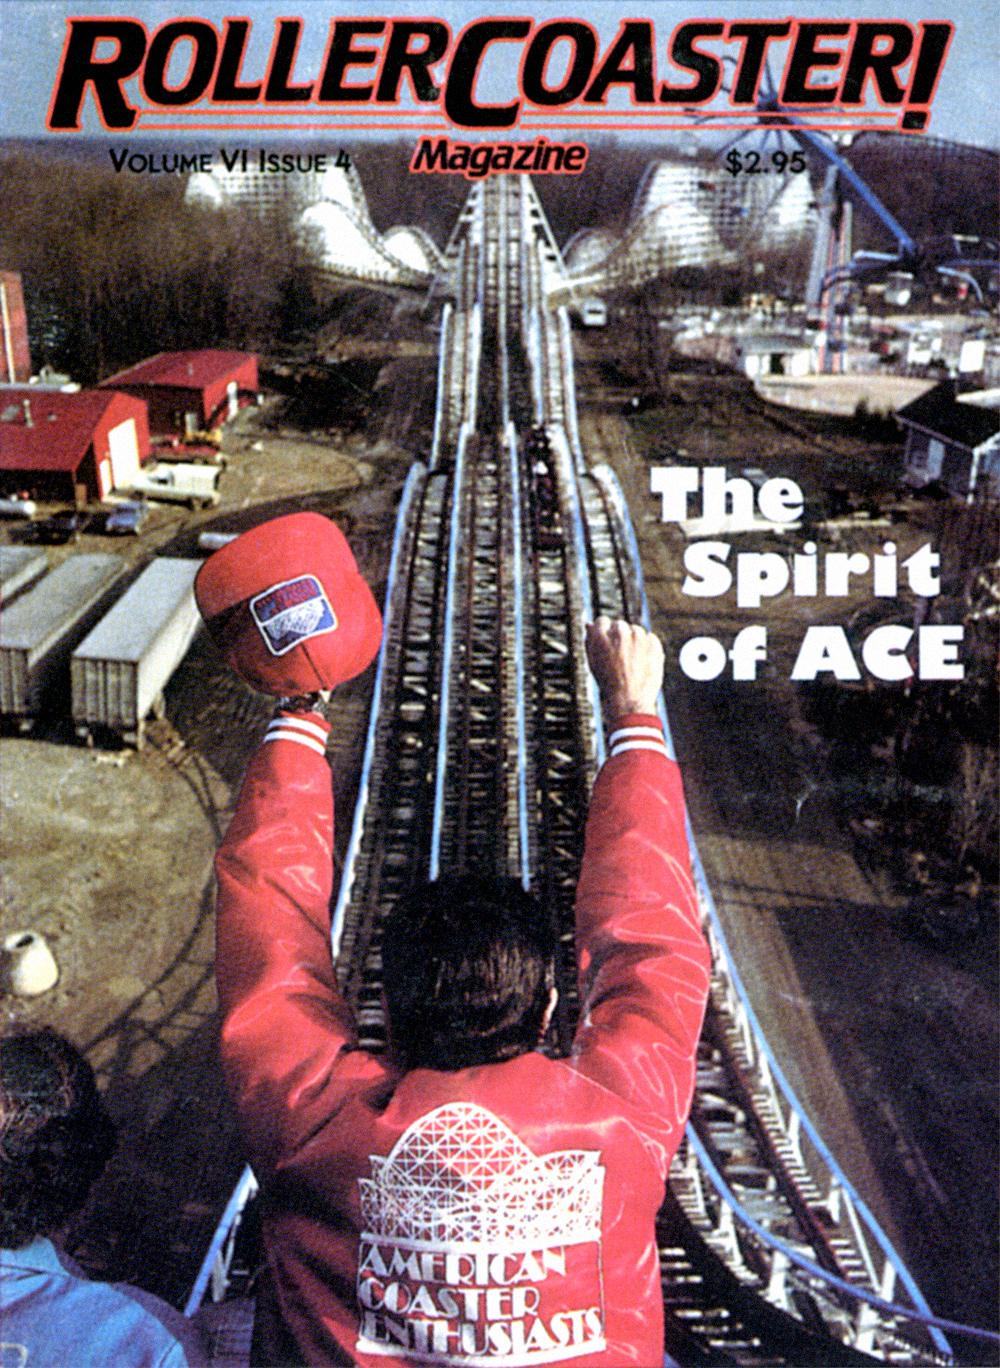 Rollercoaster!  quarterly, 1985.